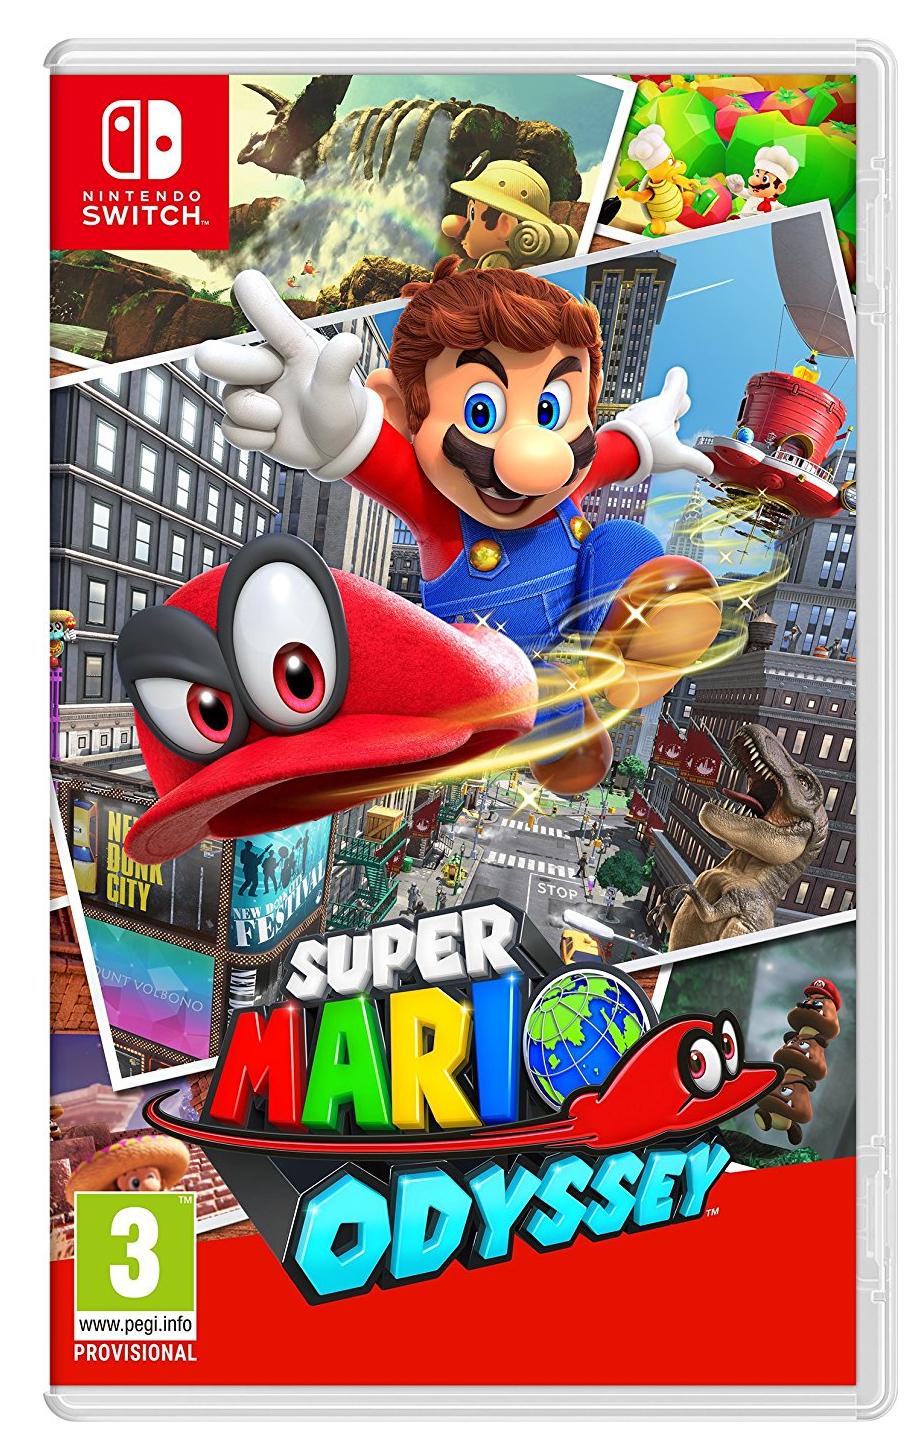 Super Mario Odyssey Nintendo Switch Digital Copy £41.99 (£39.99 with Prime) @ Amazon